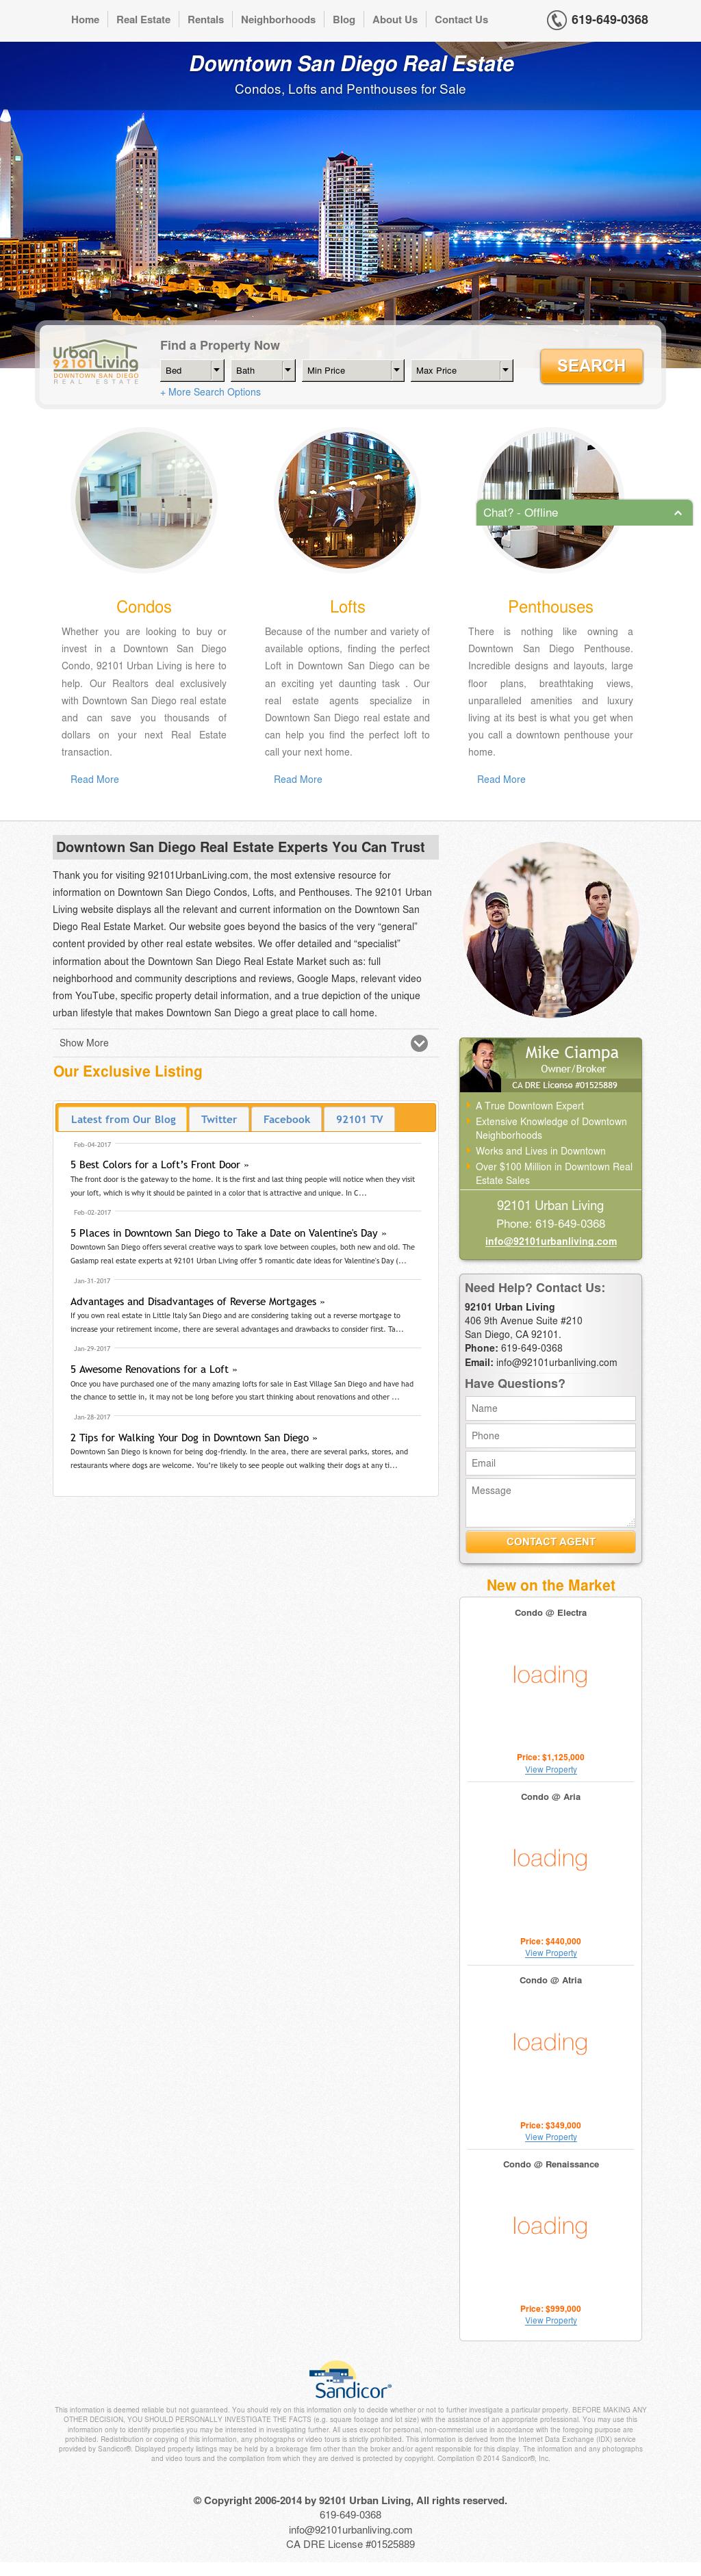 Urban 92101 Livingu0027s Website Screenshot On Feb 2017